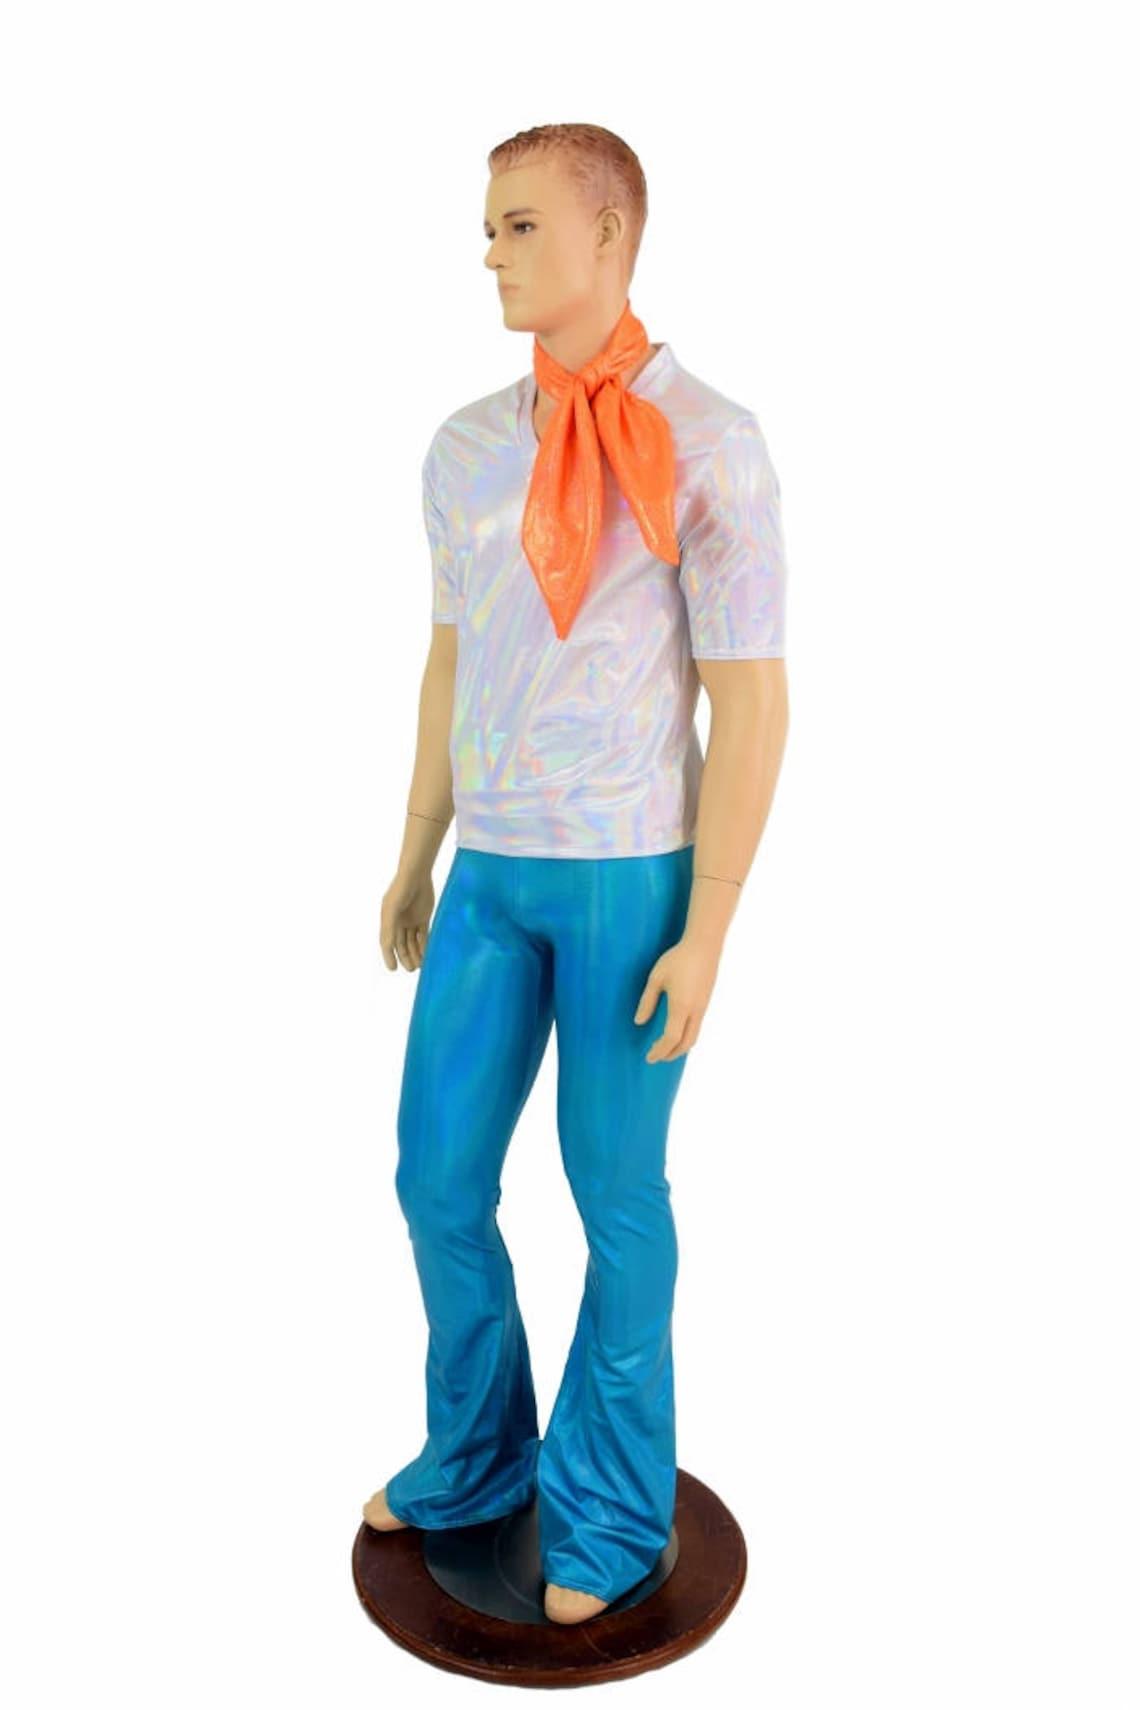 60s – 70s Mens Bell Bottom Jeans, Flares, Disco Pants 70s Super Sleuth Set Mens Flashbulb Holographic V Neck Short Sleeve Top & Peacock Blue Bootcut Pants w/Orange Sparkly Jewel Ascot 154783 $110.00 AT vintagedancer.com